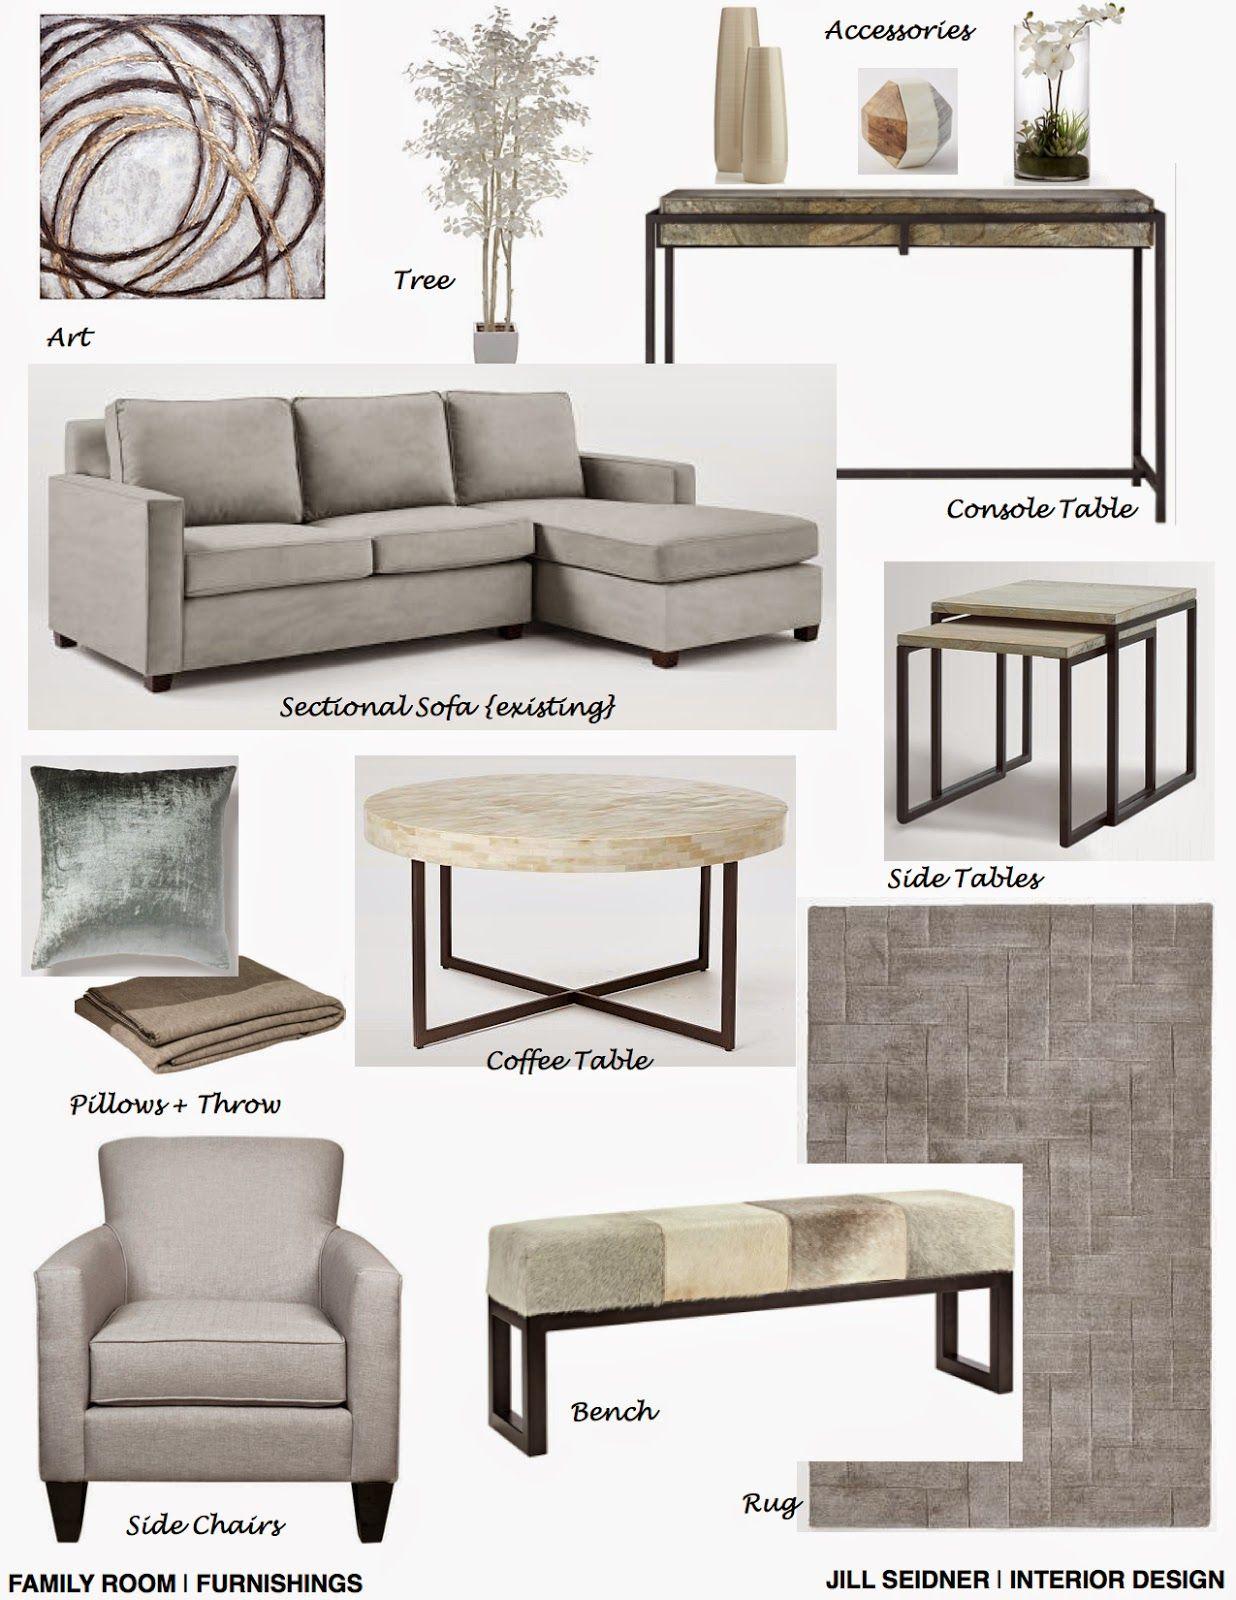 Help Designing A Room: Design Public Interior By Vivien Compagnon At Coroflot.com